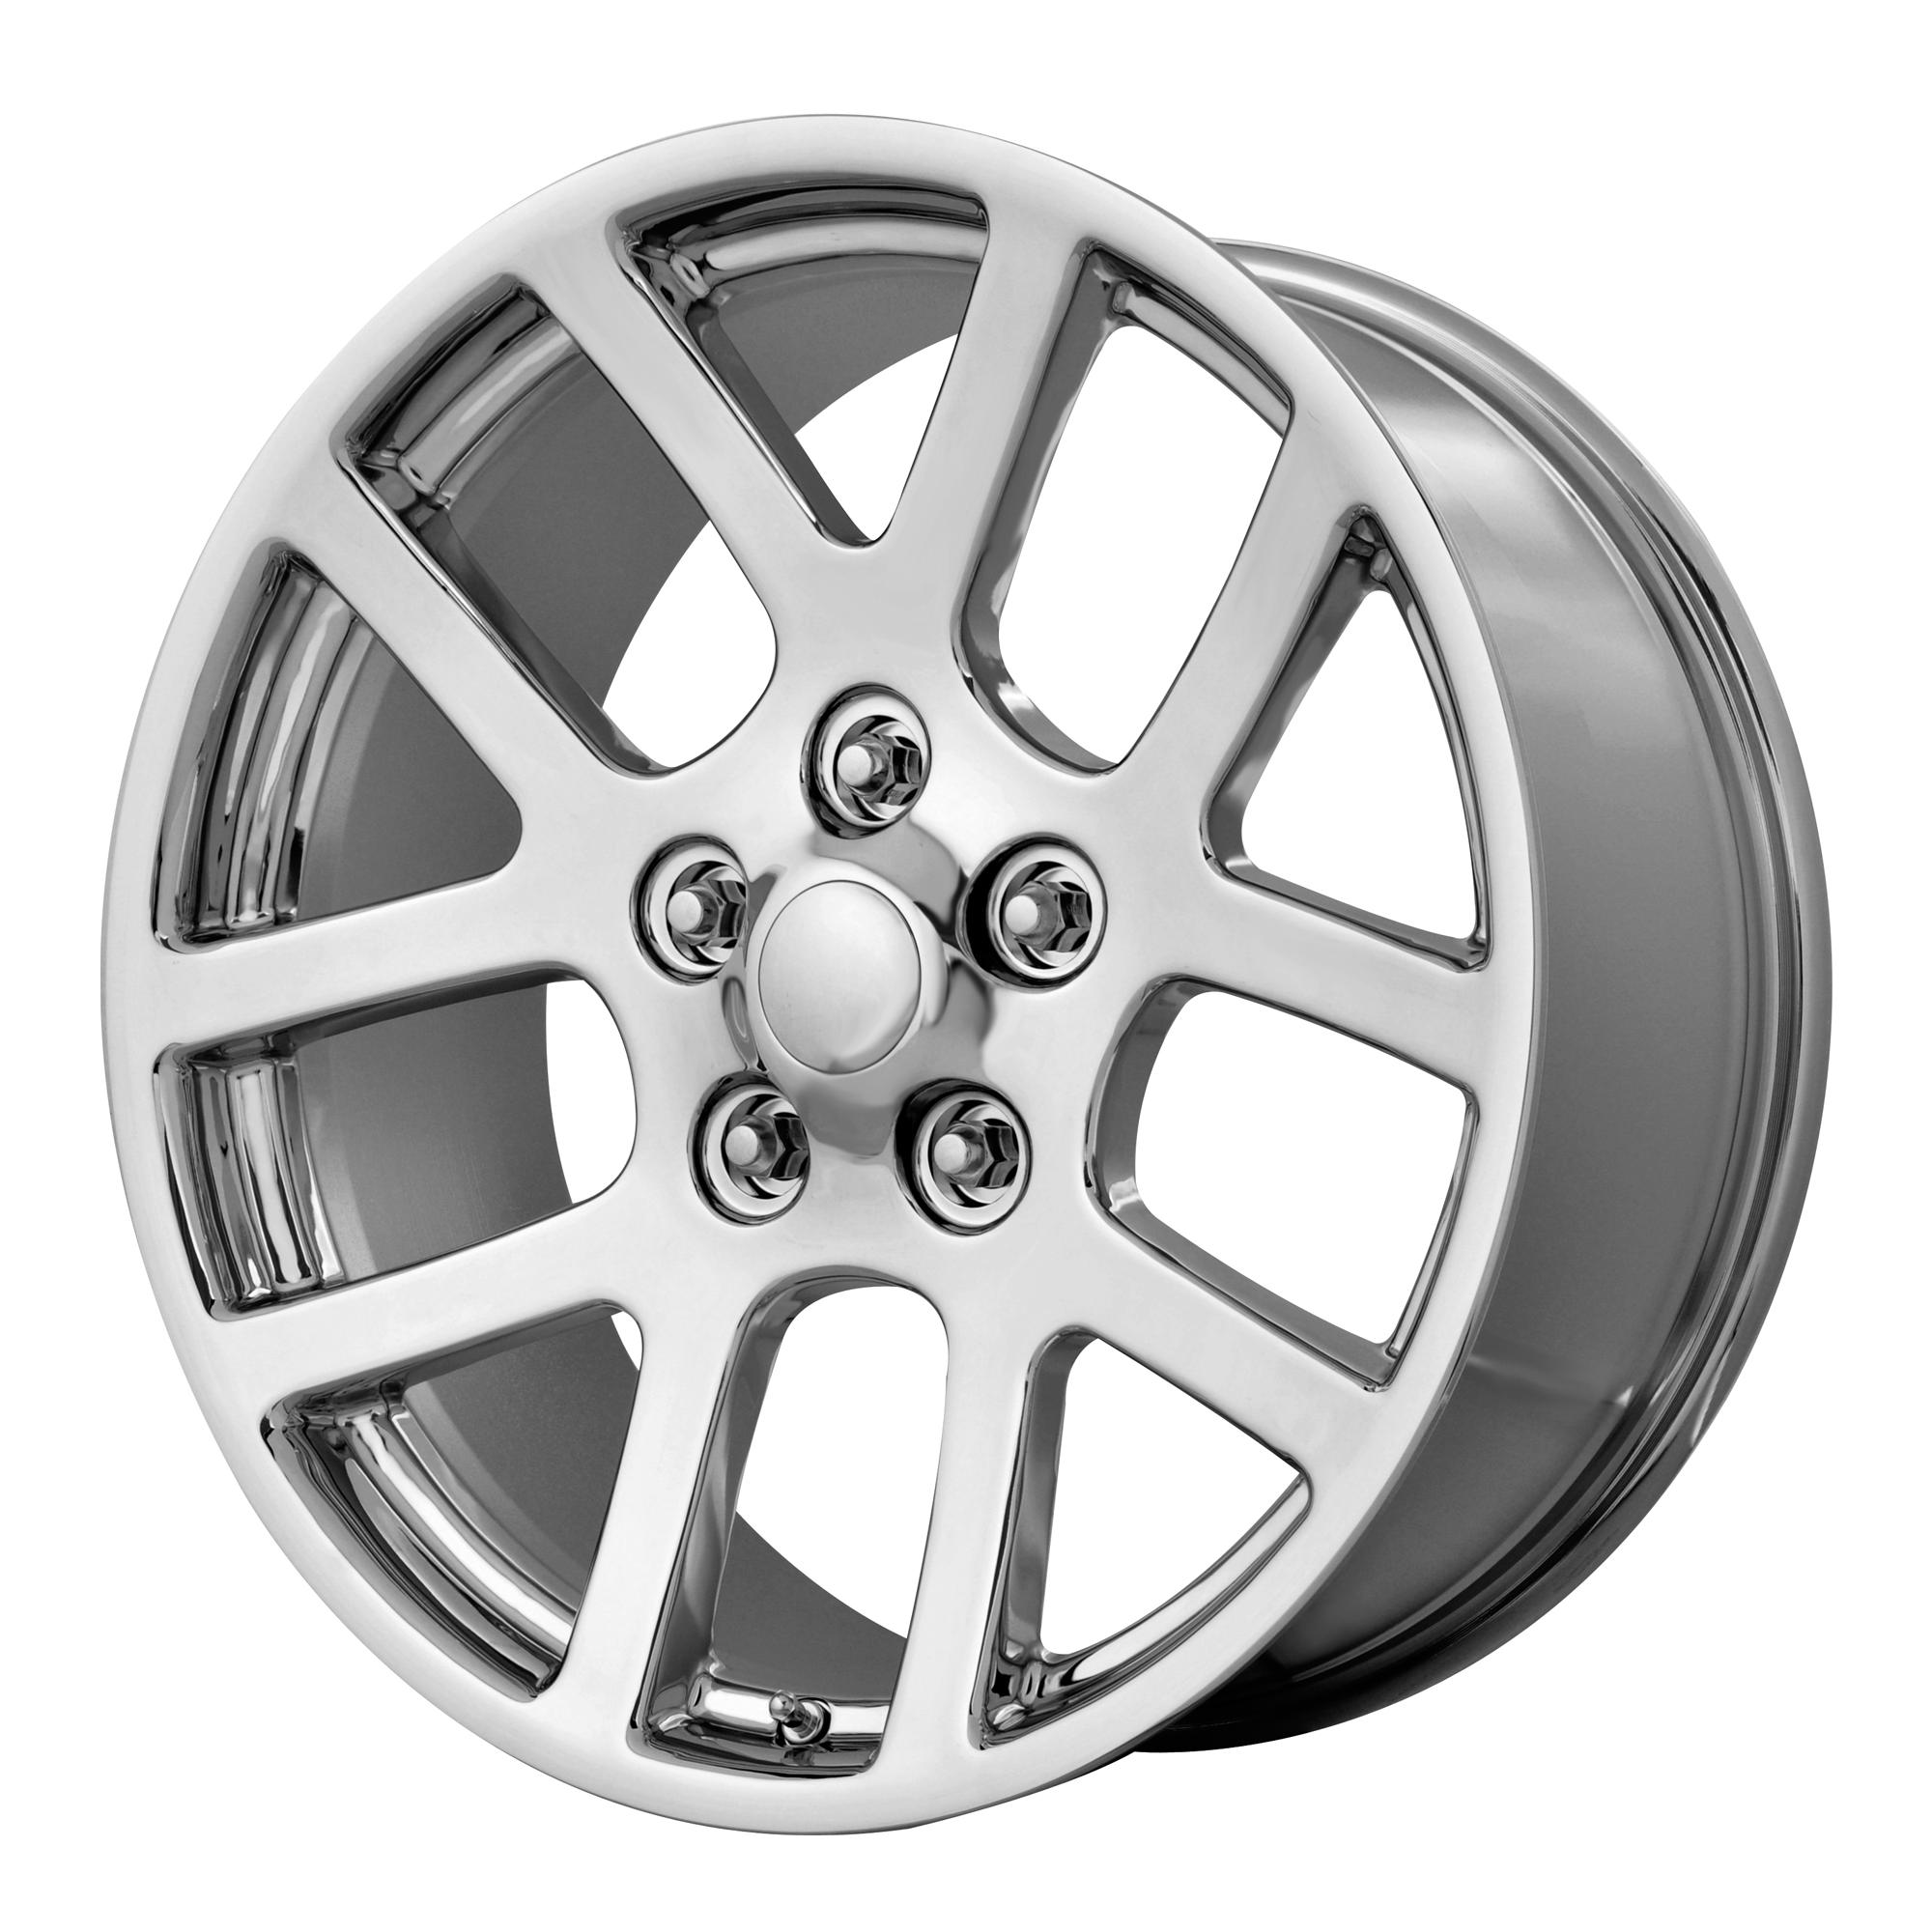 OE Creations Replica Wheels OE Creations 107C Chrome